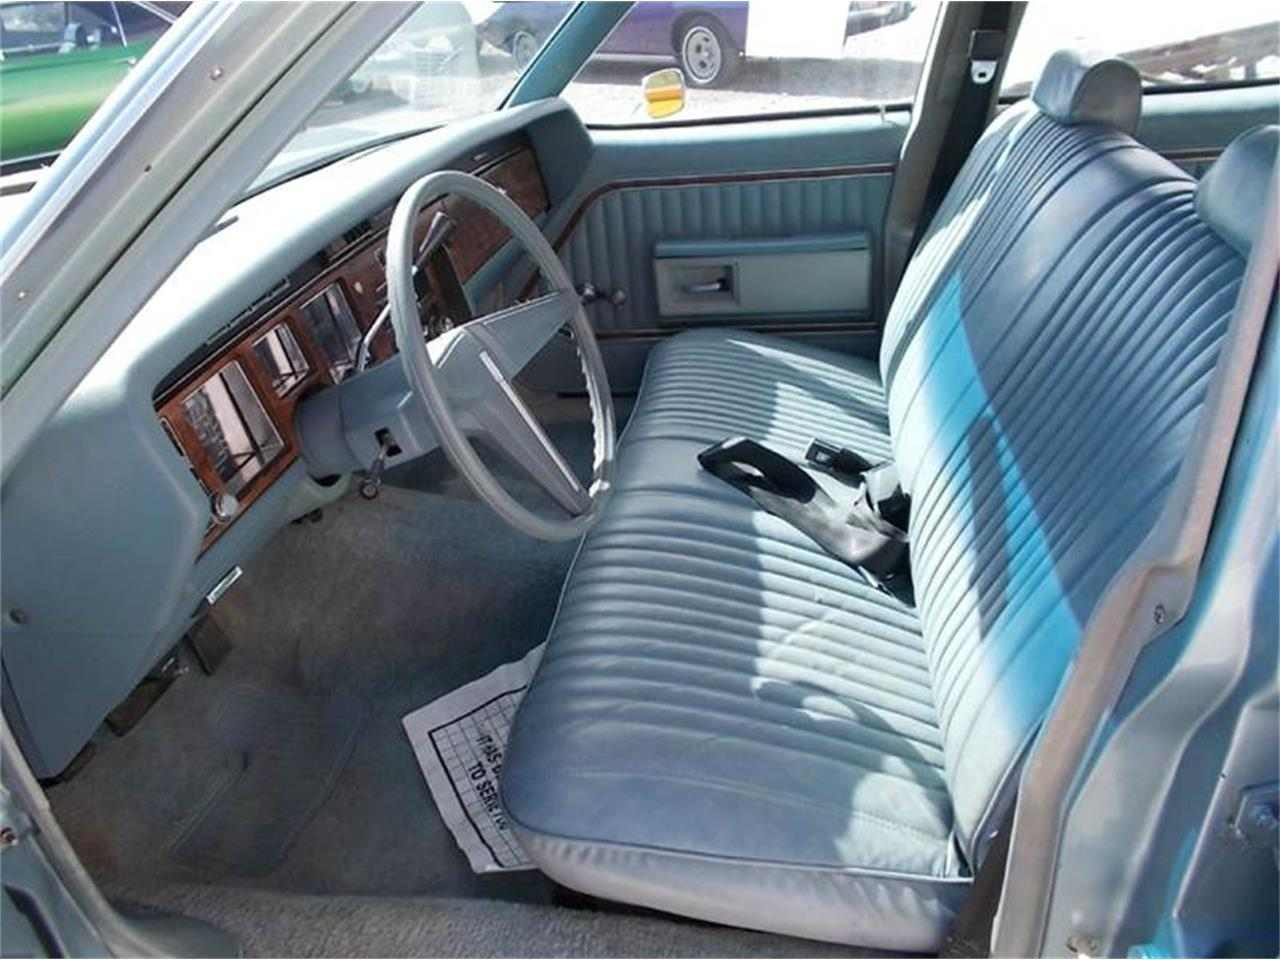 Large Picture of 1978 Pontiac Catalina located in Staunton Illinois - $6,950.00 - K4GZ